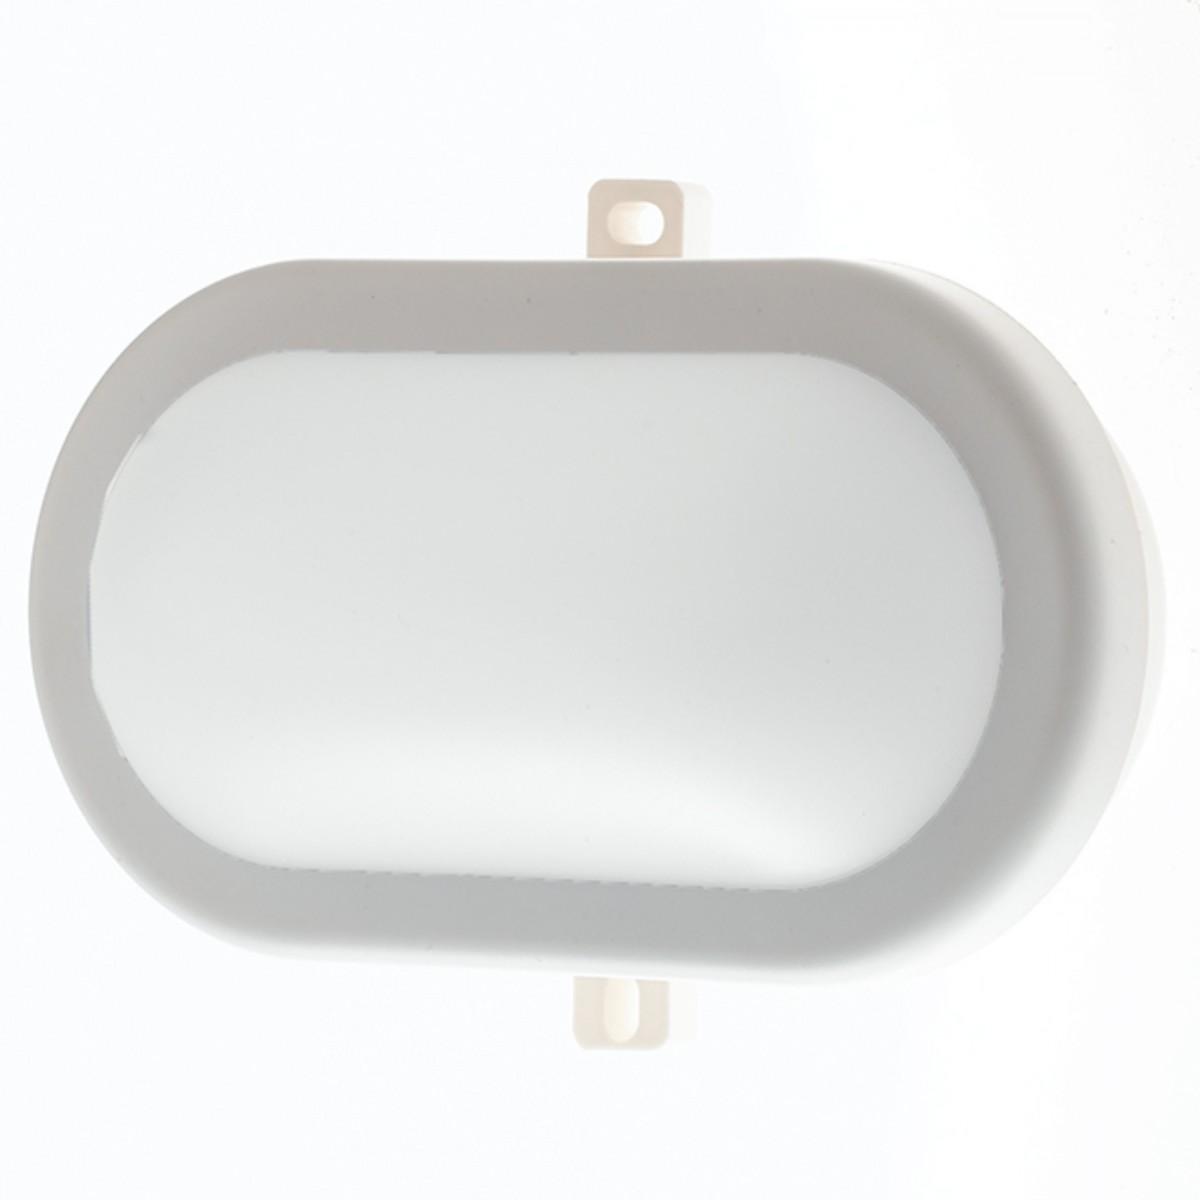 Plafonnier LED blanc A + 4000kelvin 10